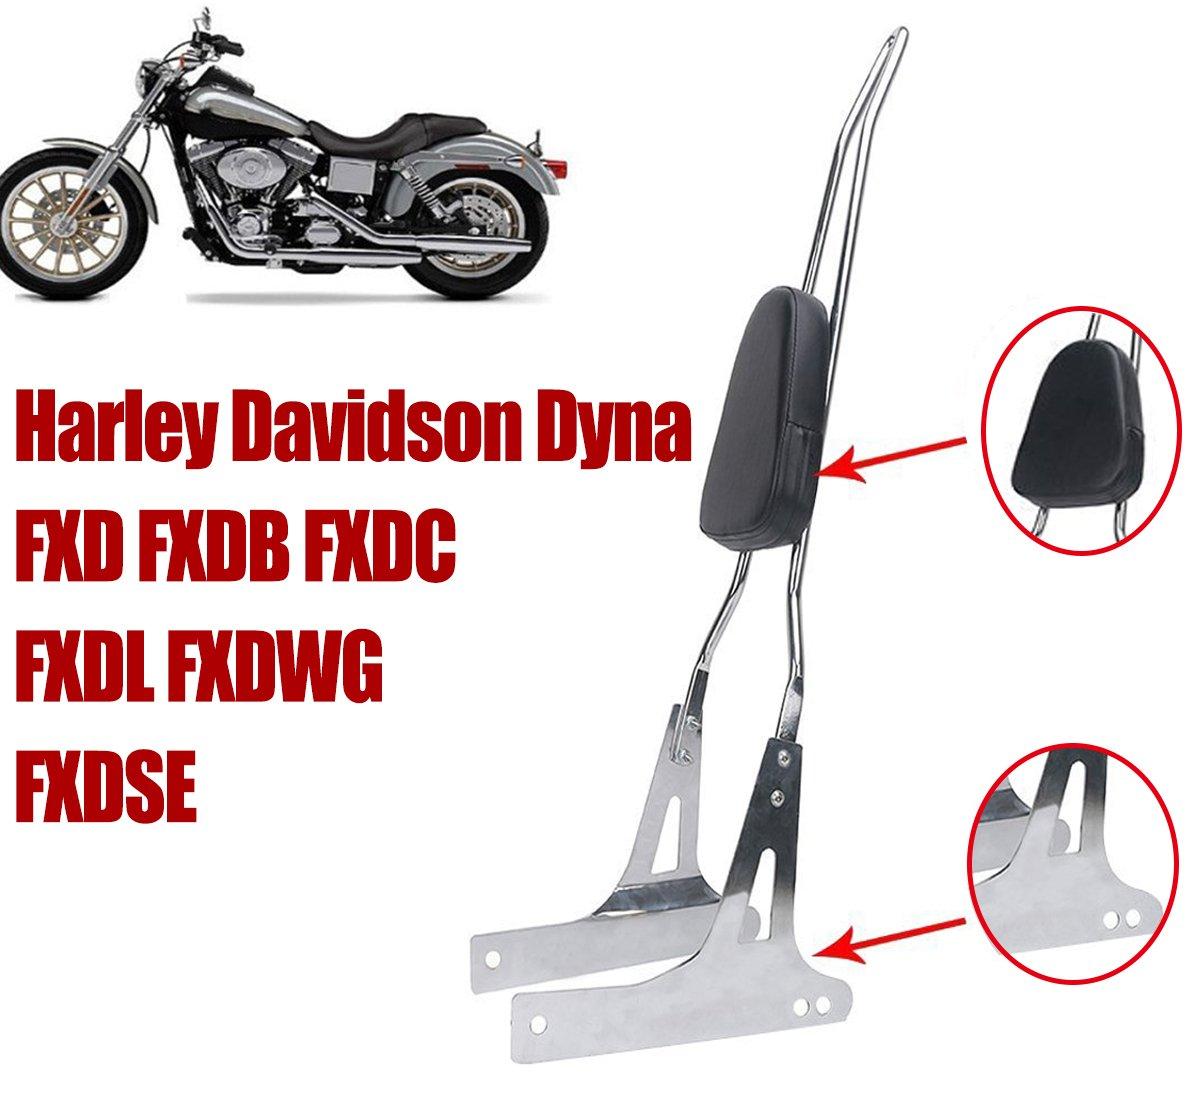 E-Most luxurious Detachable Chrome Rear Backrest Sissy Bar Pad For Harley Davidson Dyna FXD FXDB FXDC FXDL FXDWG FXDSE_1 Set